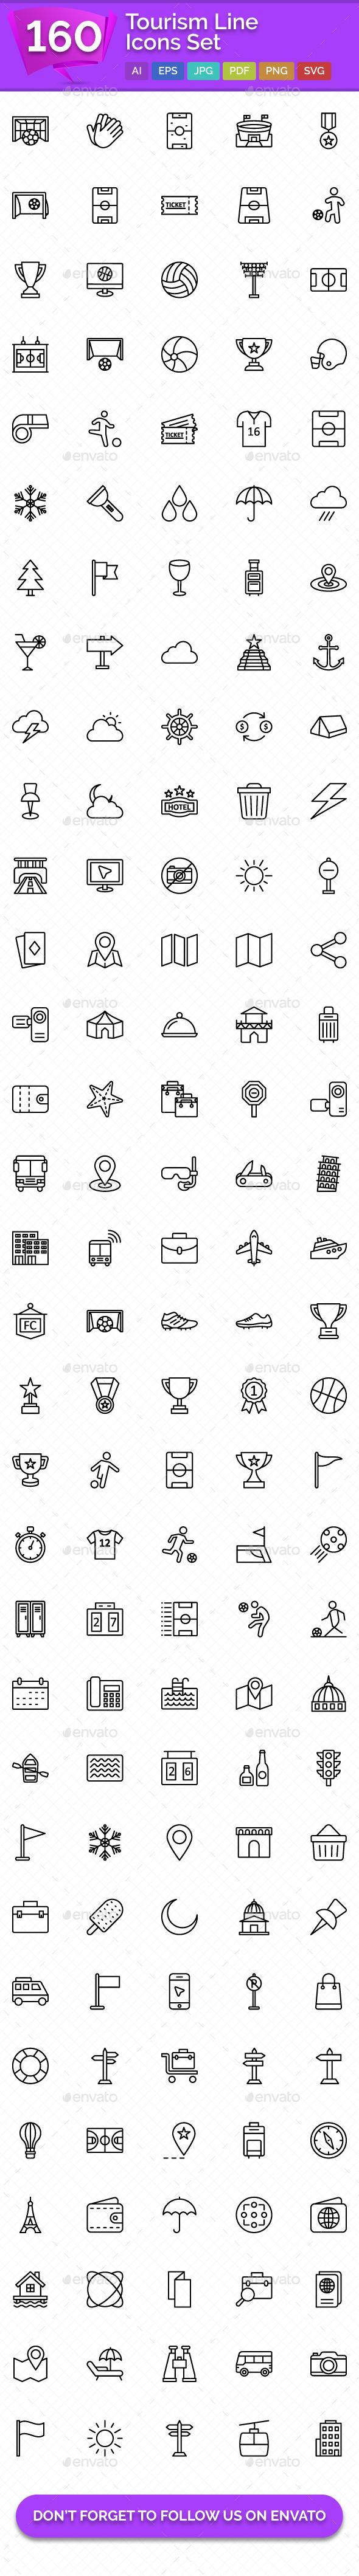 160 Tourism Line Icons Set